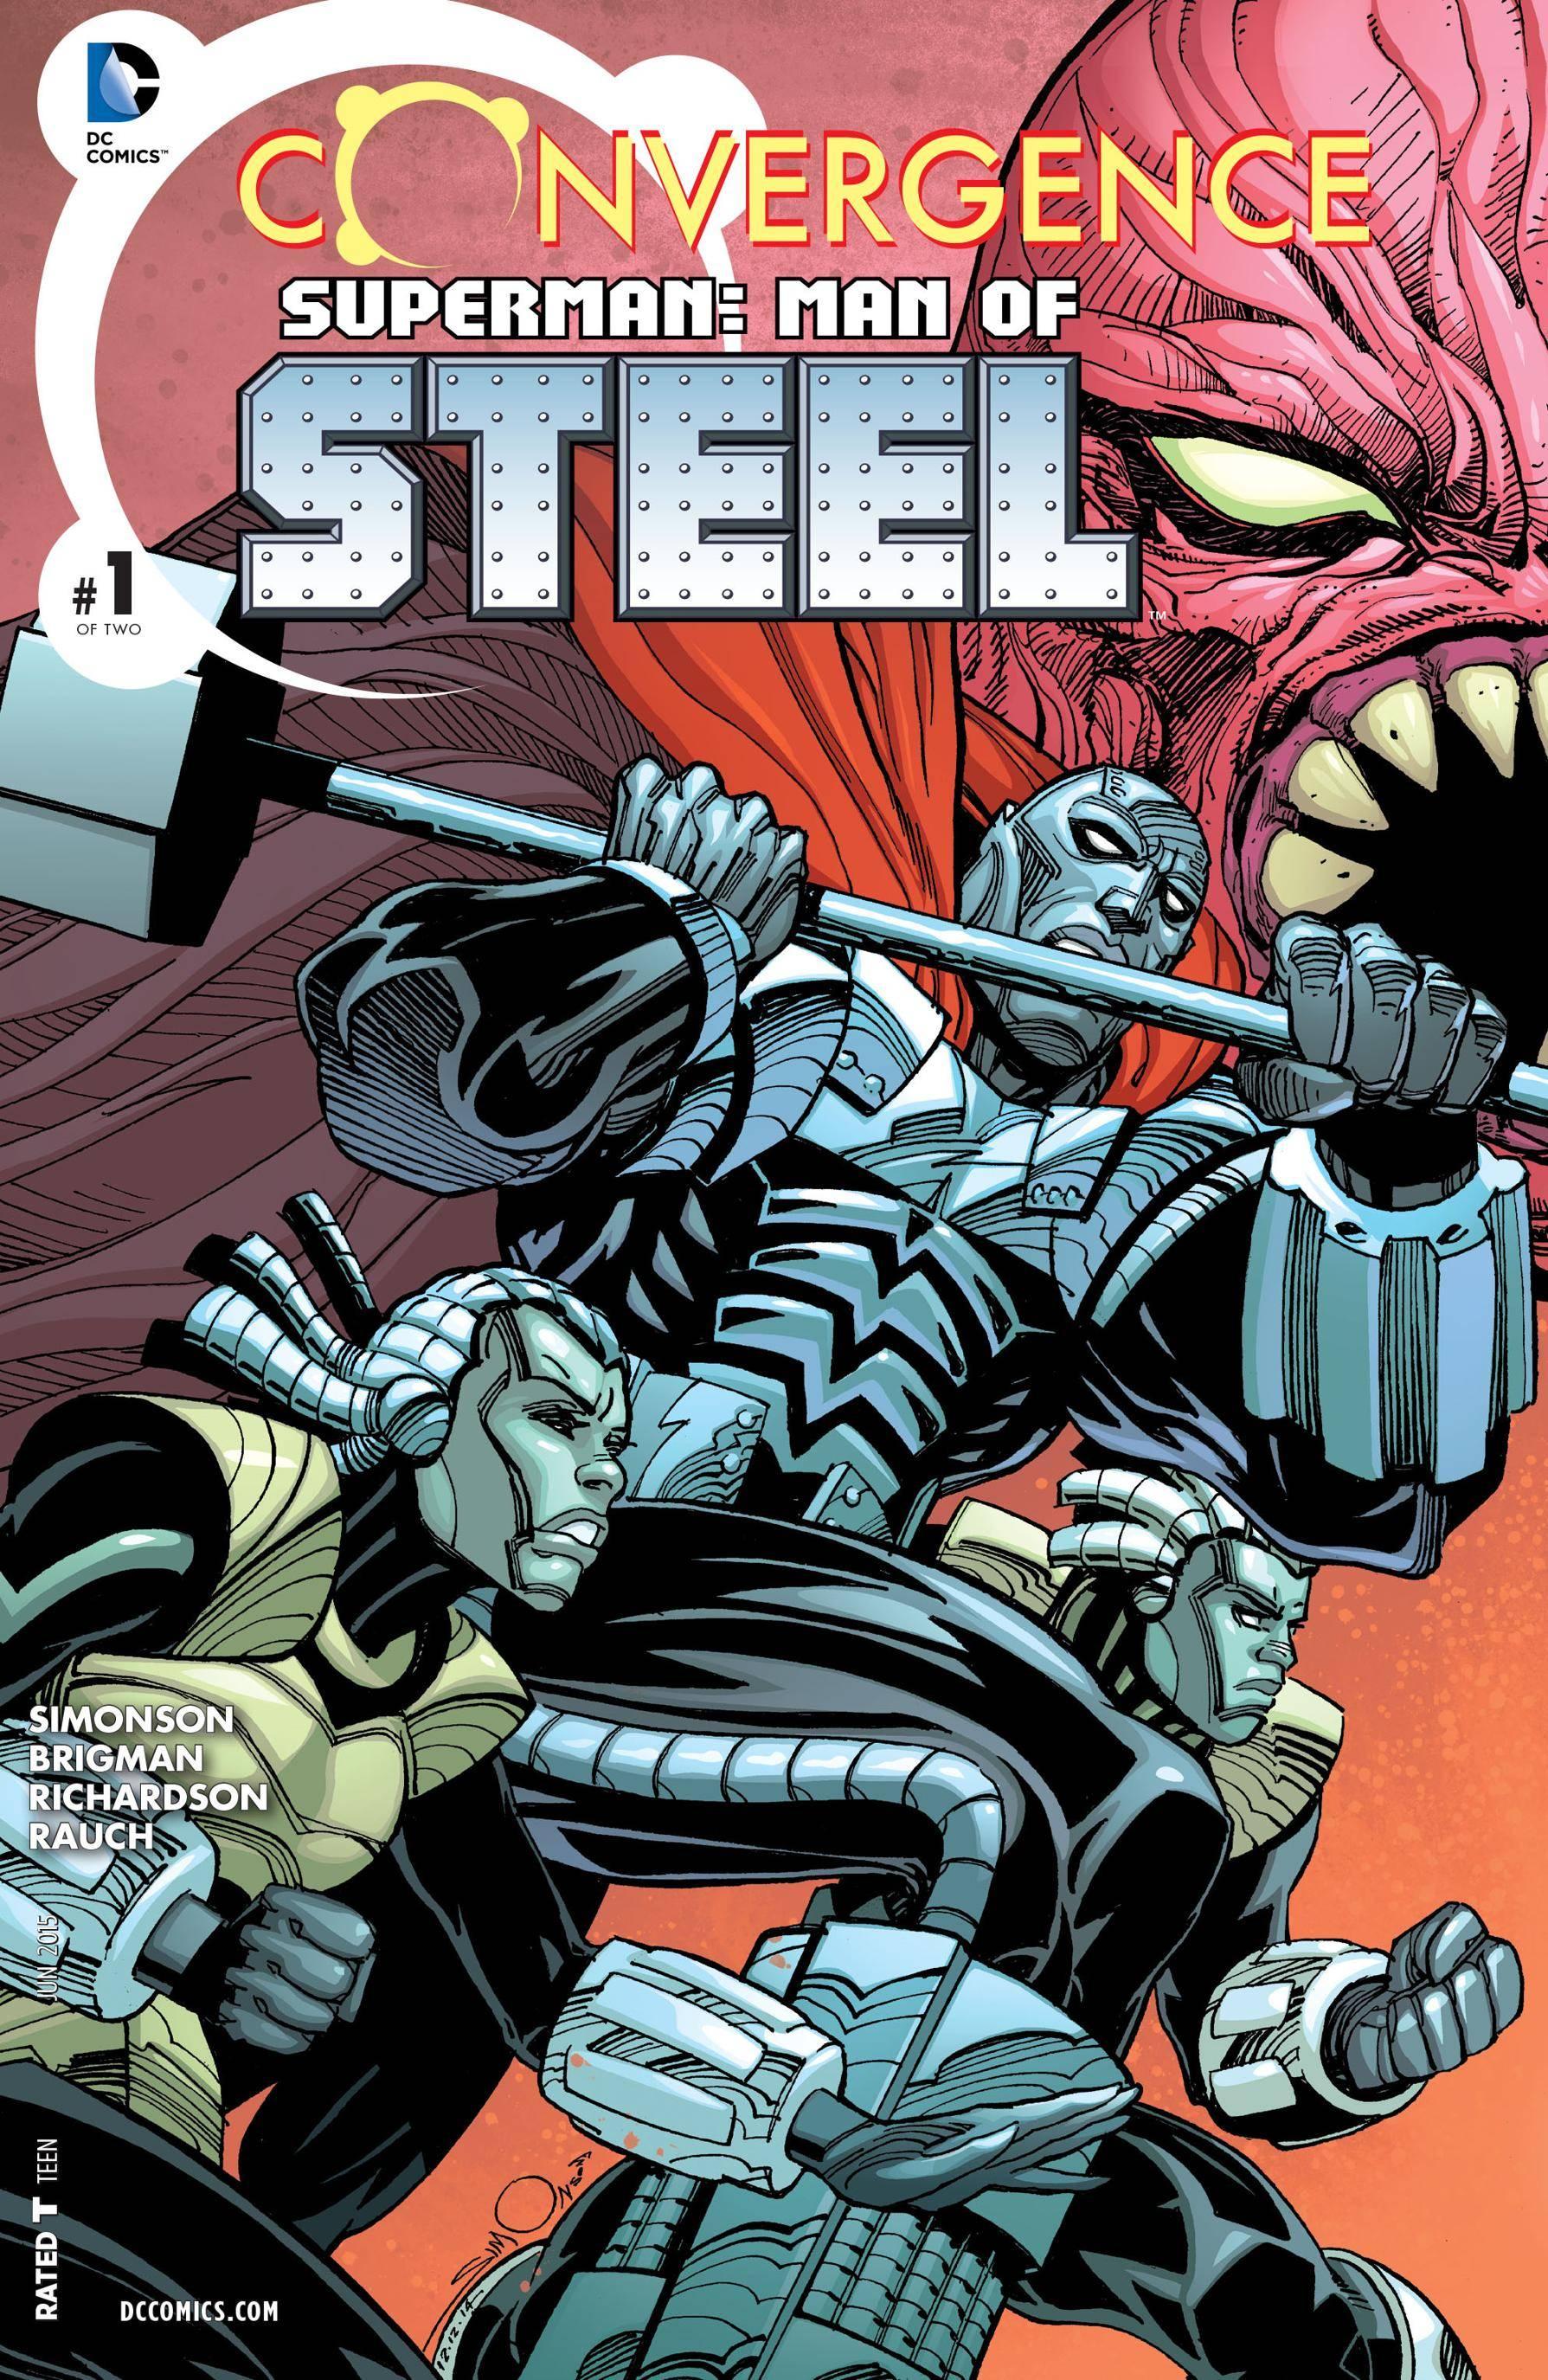 Convergence - Superman - Man of Steel 001 2015 Digital